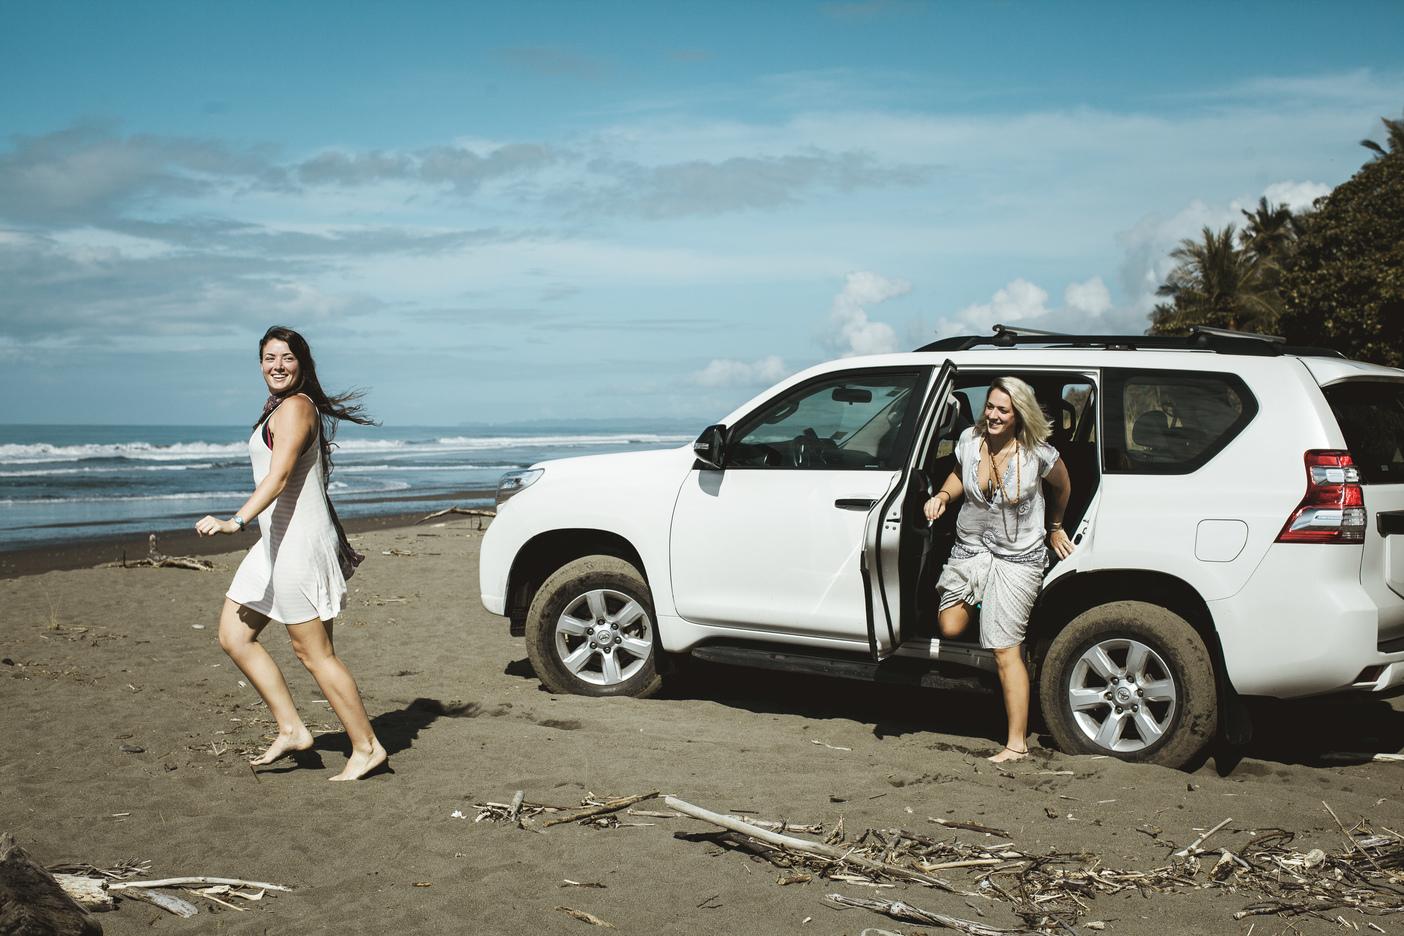 costa-rica-yoga-retreat-venue-experience-retreats-_beachcarpeople_wildleadership.jpg